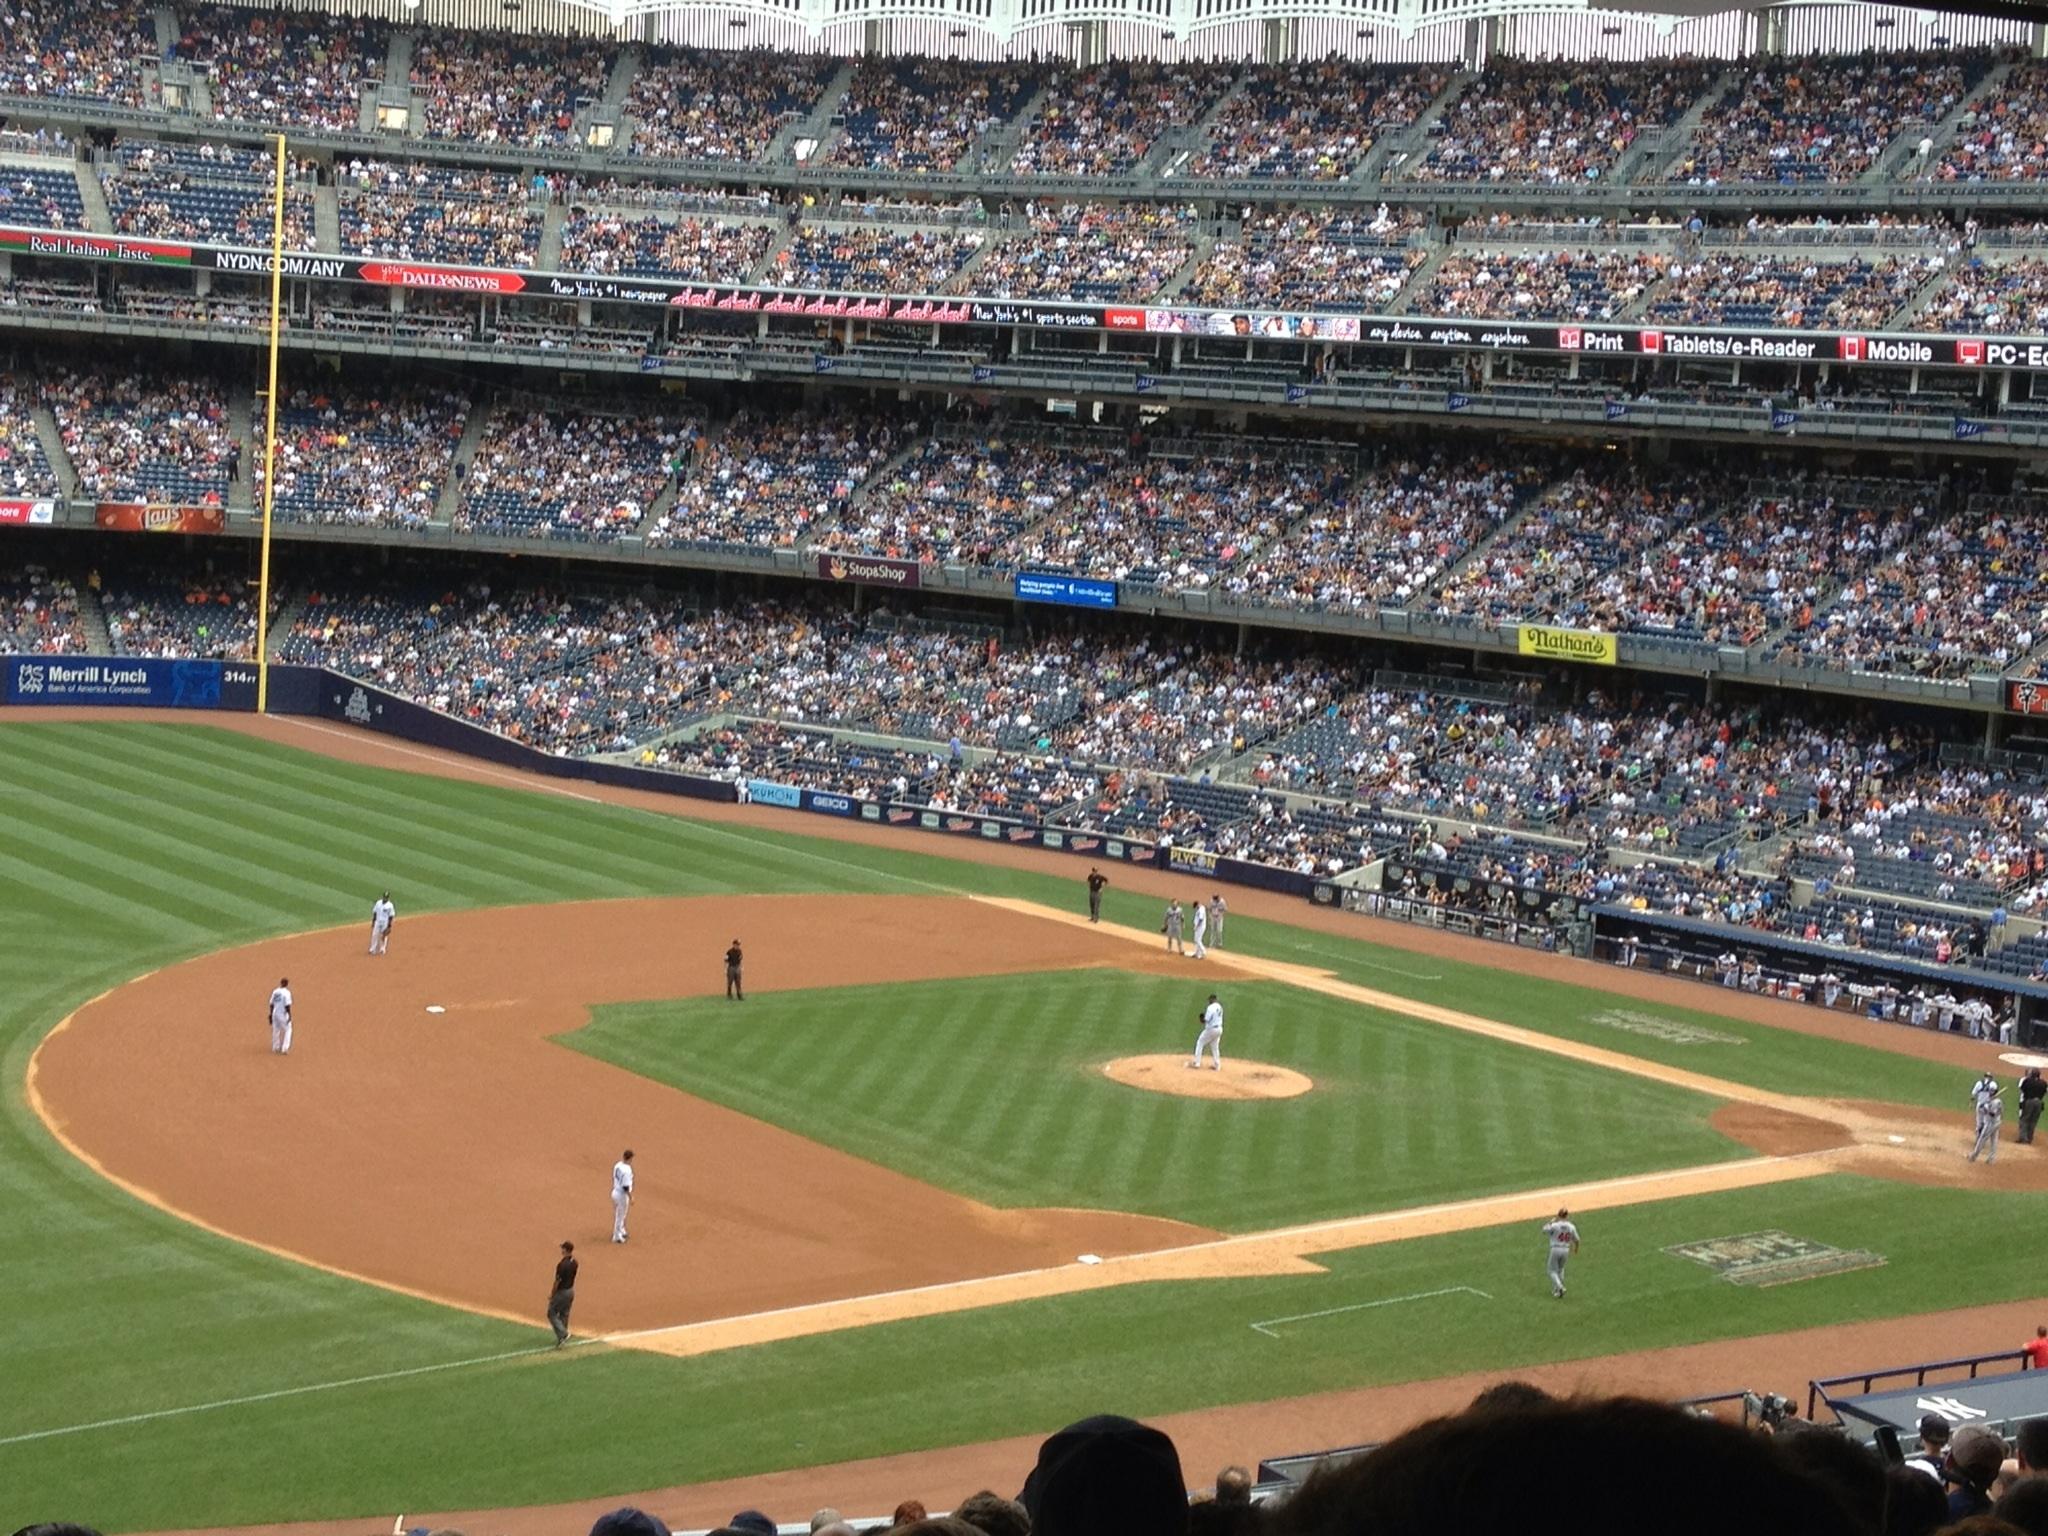 New York Yankees during a game in Yankee Stadium